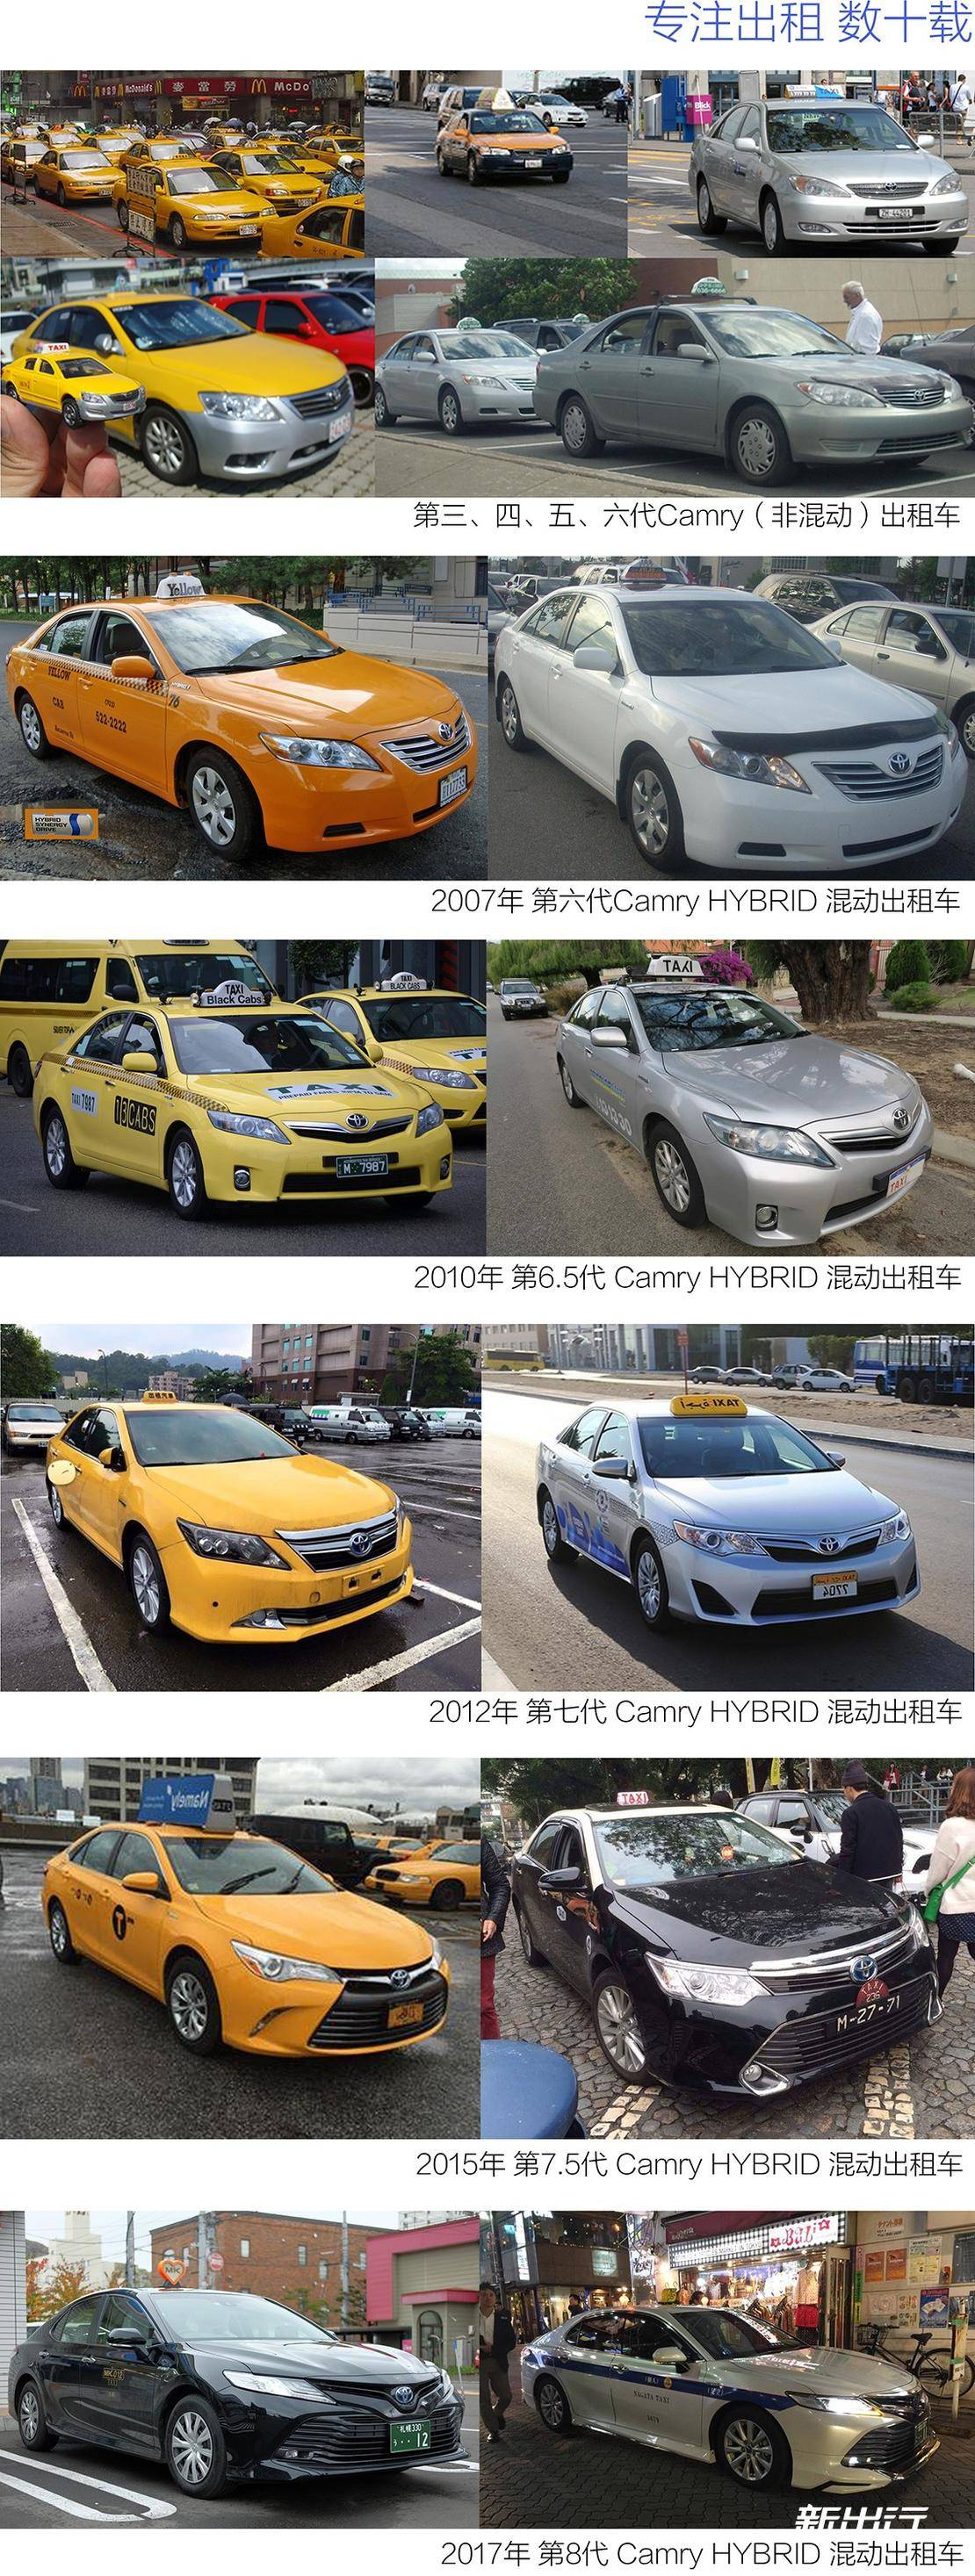 Toyota_Camry_hybrid_DCA_07_2009_Taxi_VA_6400.jpg